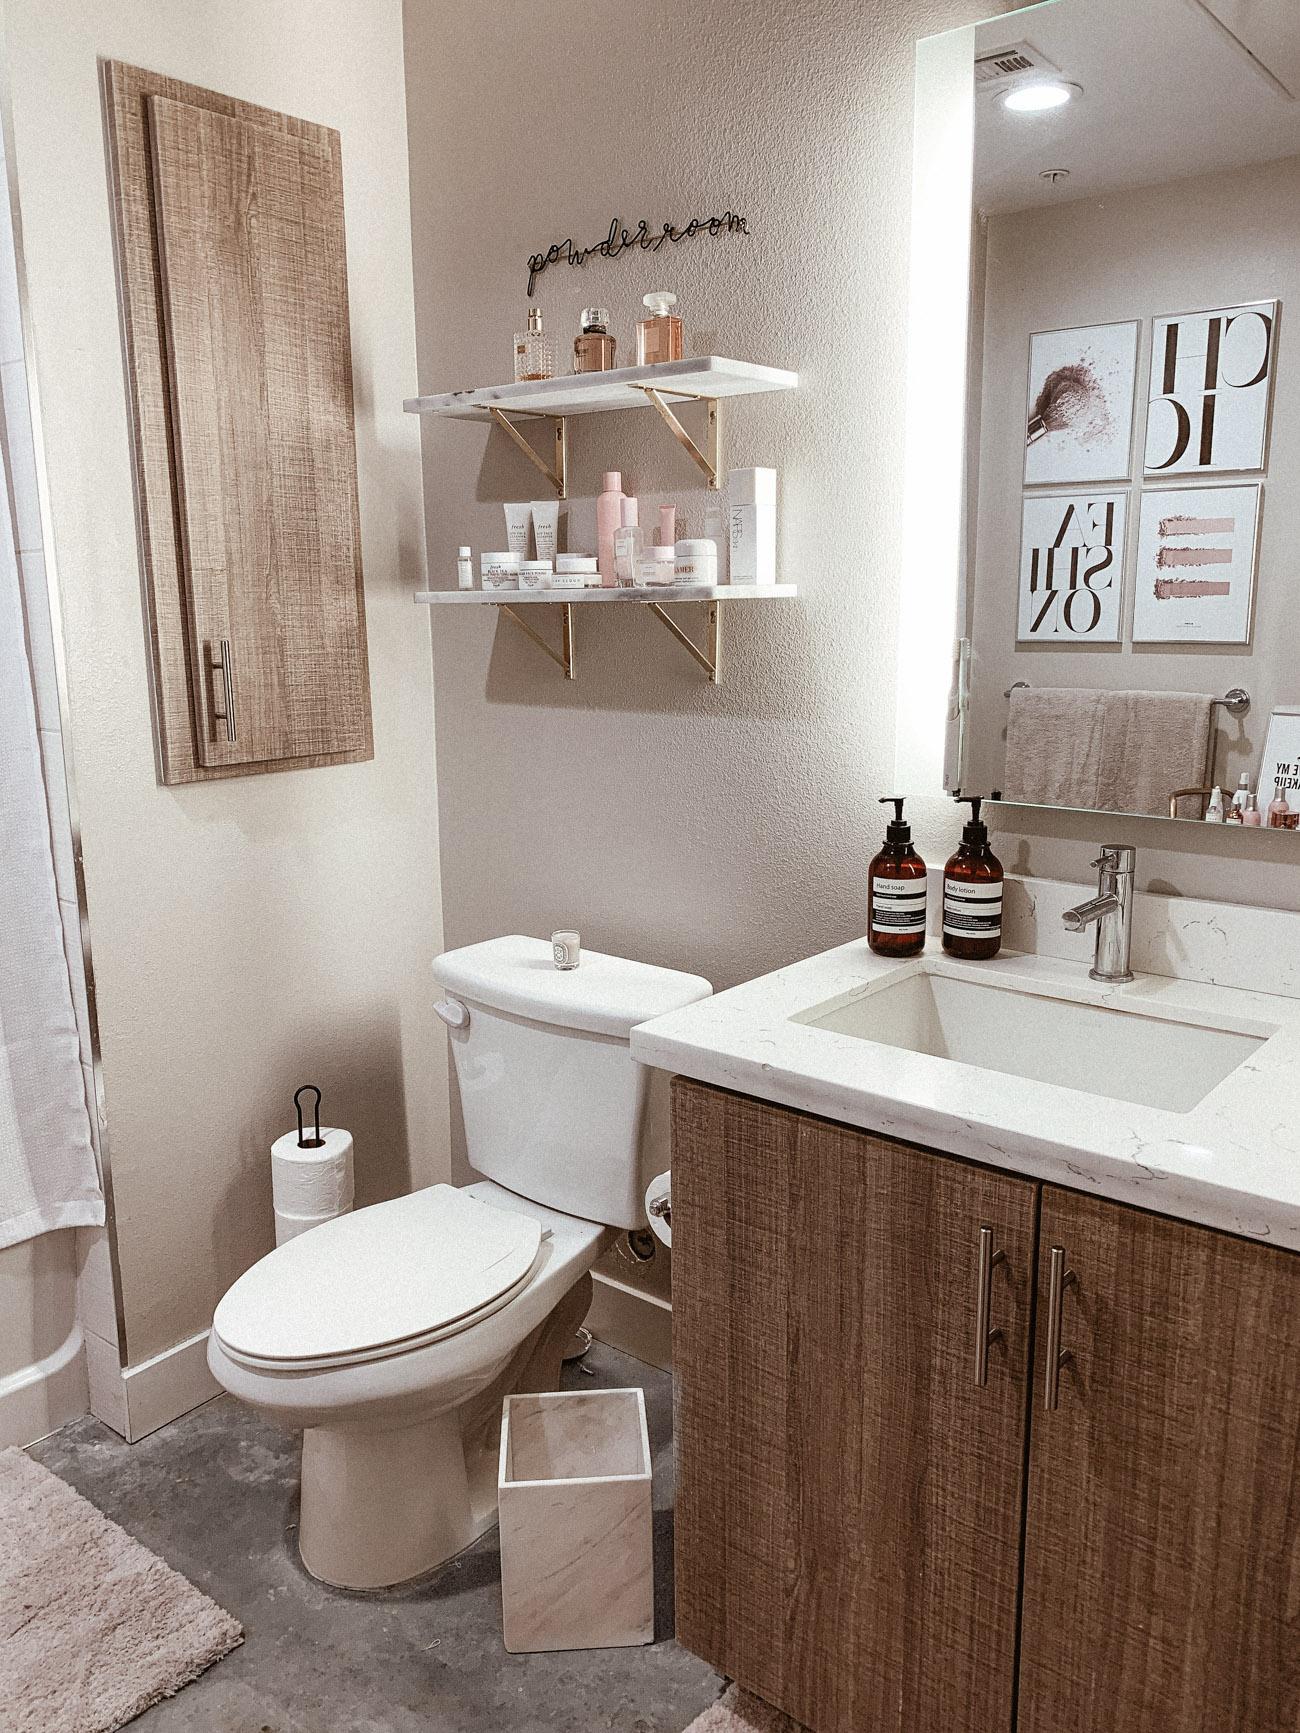 My Apartment Bathroom Decor - BLONDIE IN THE CITY on Apartment Bathroom Ideas  id=18960